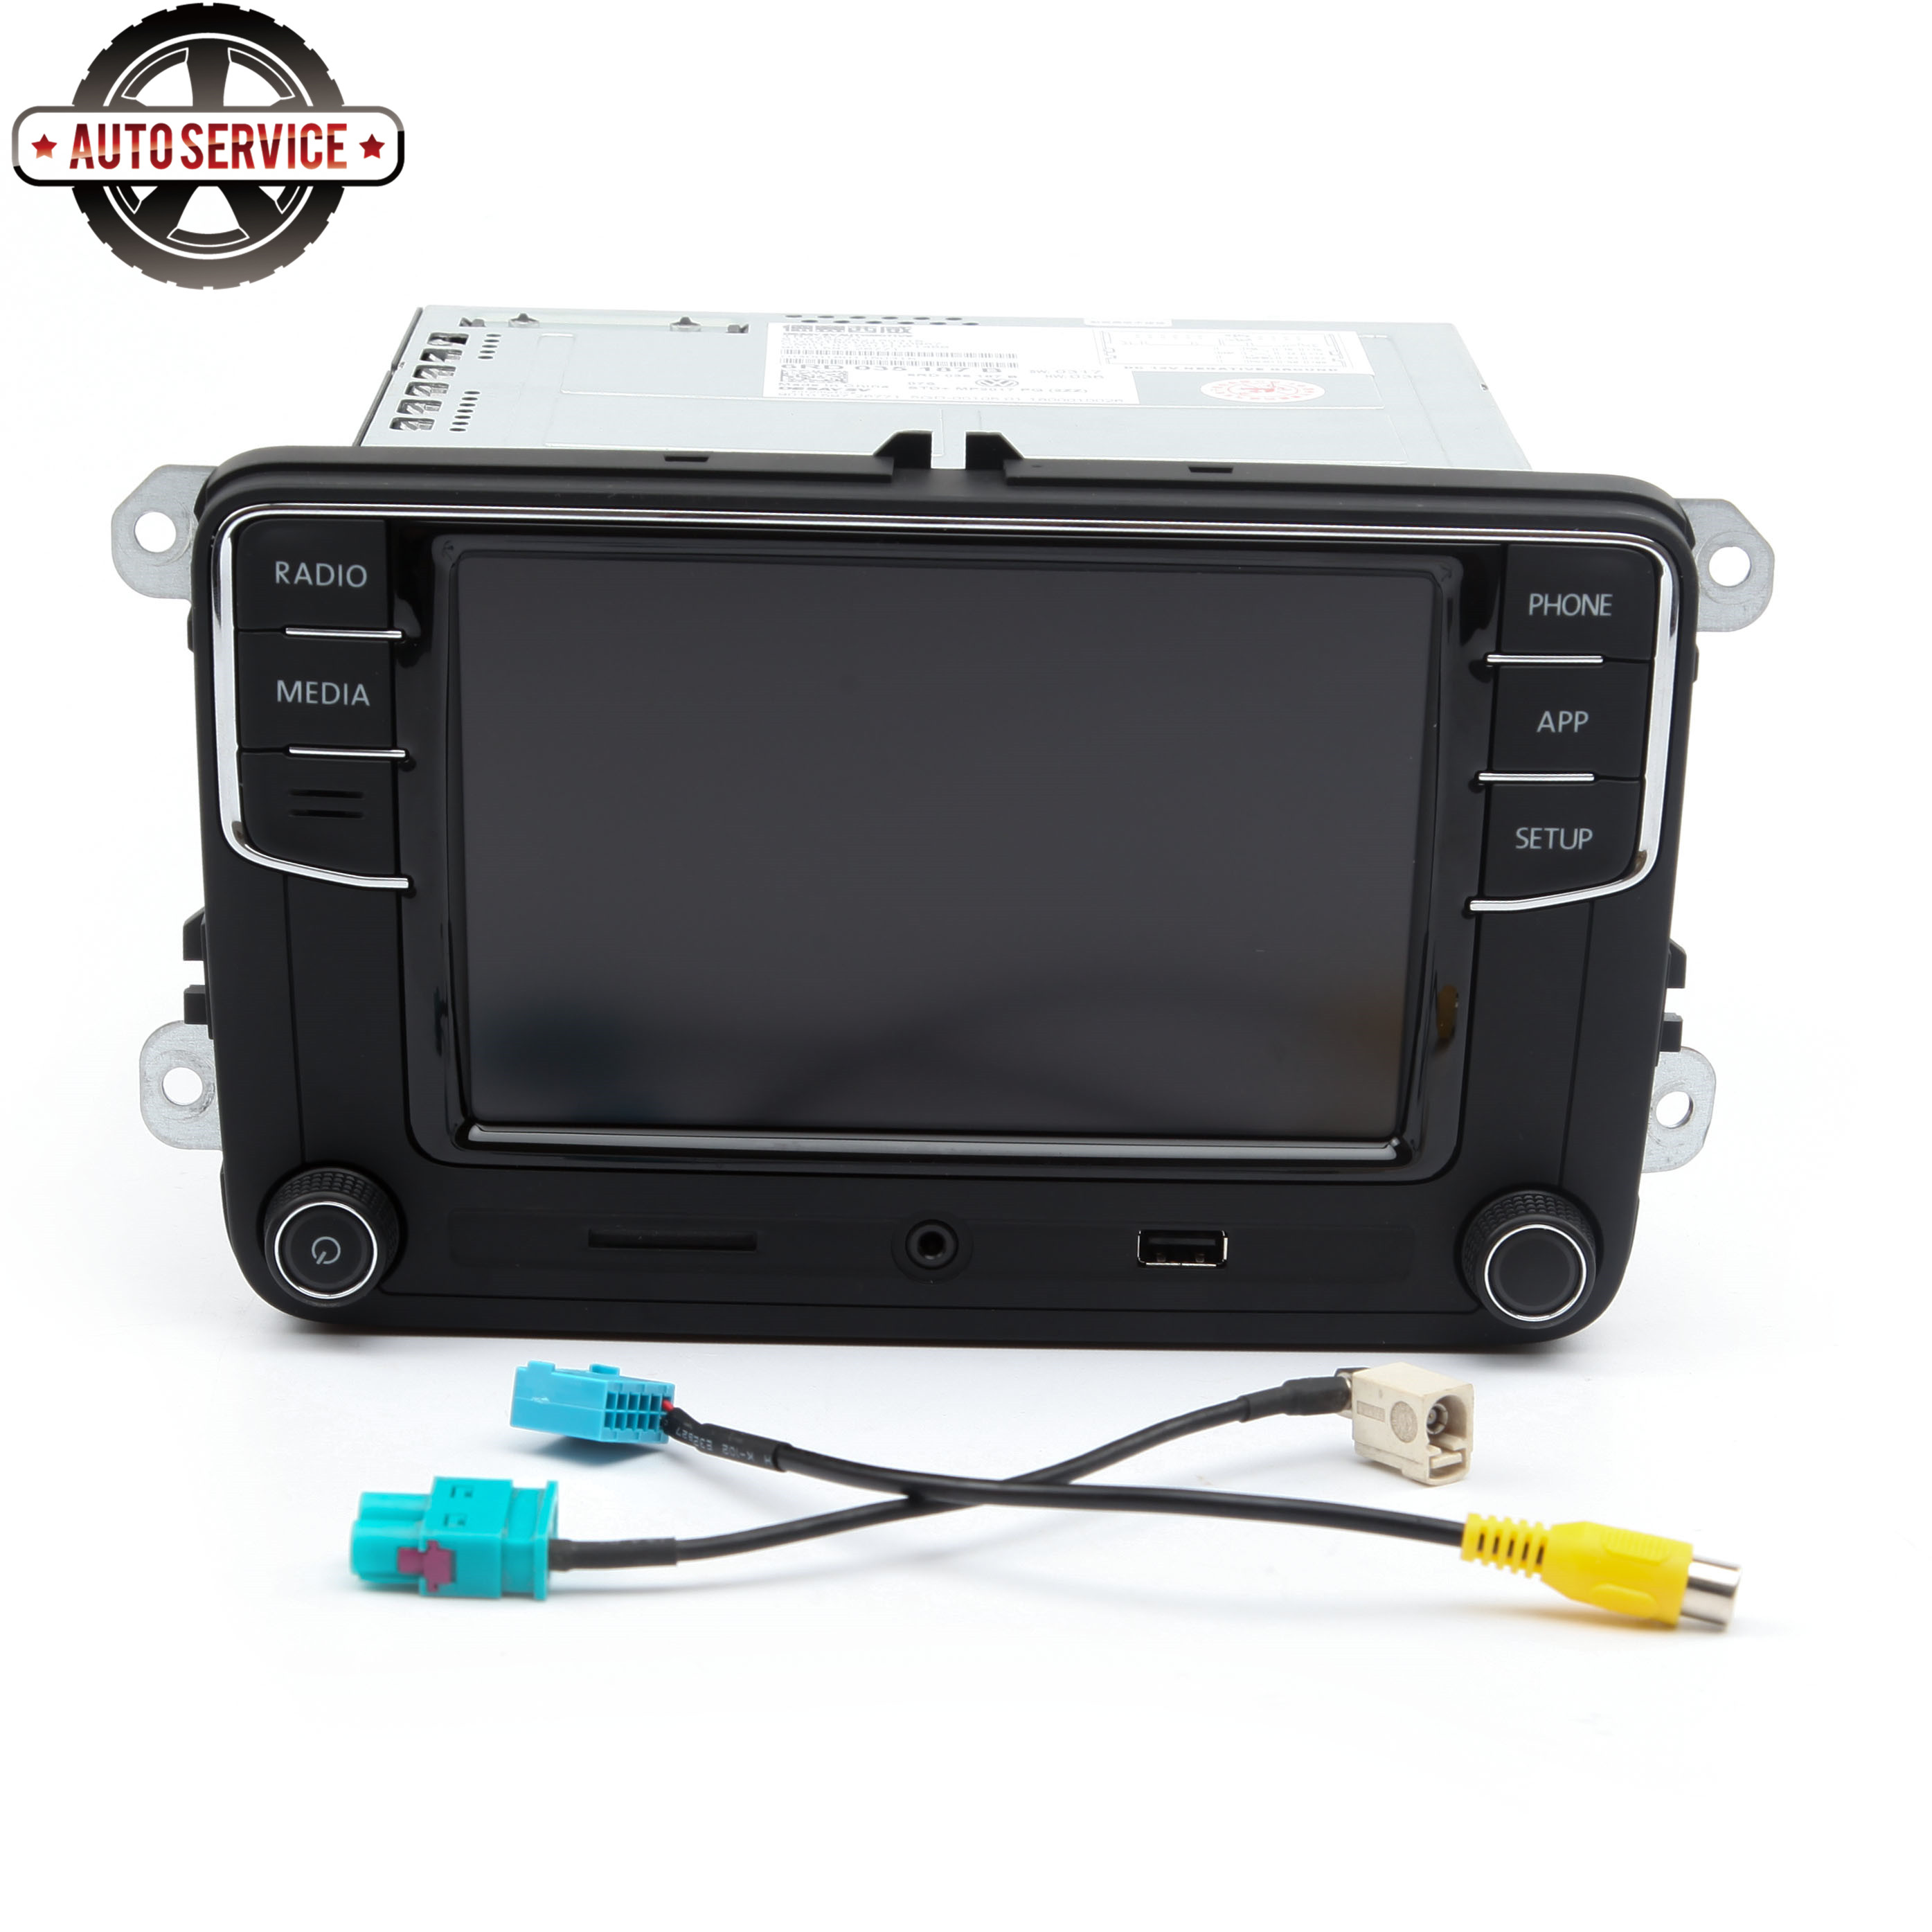 Nuevo RCD330 más RCD330G Carplay MIB 6,5 pulgadas Radio para Jetta MK5 MK6 CC Passat 6RD035187B 1GB de RAM cámara de Vista trasera Bluetooth USB - 2